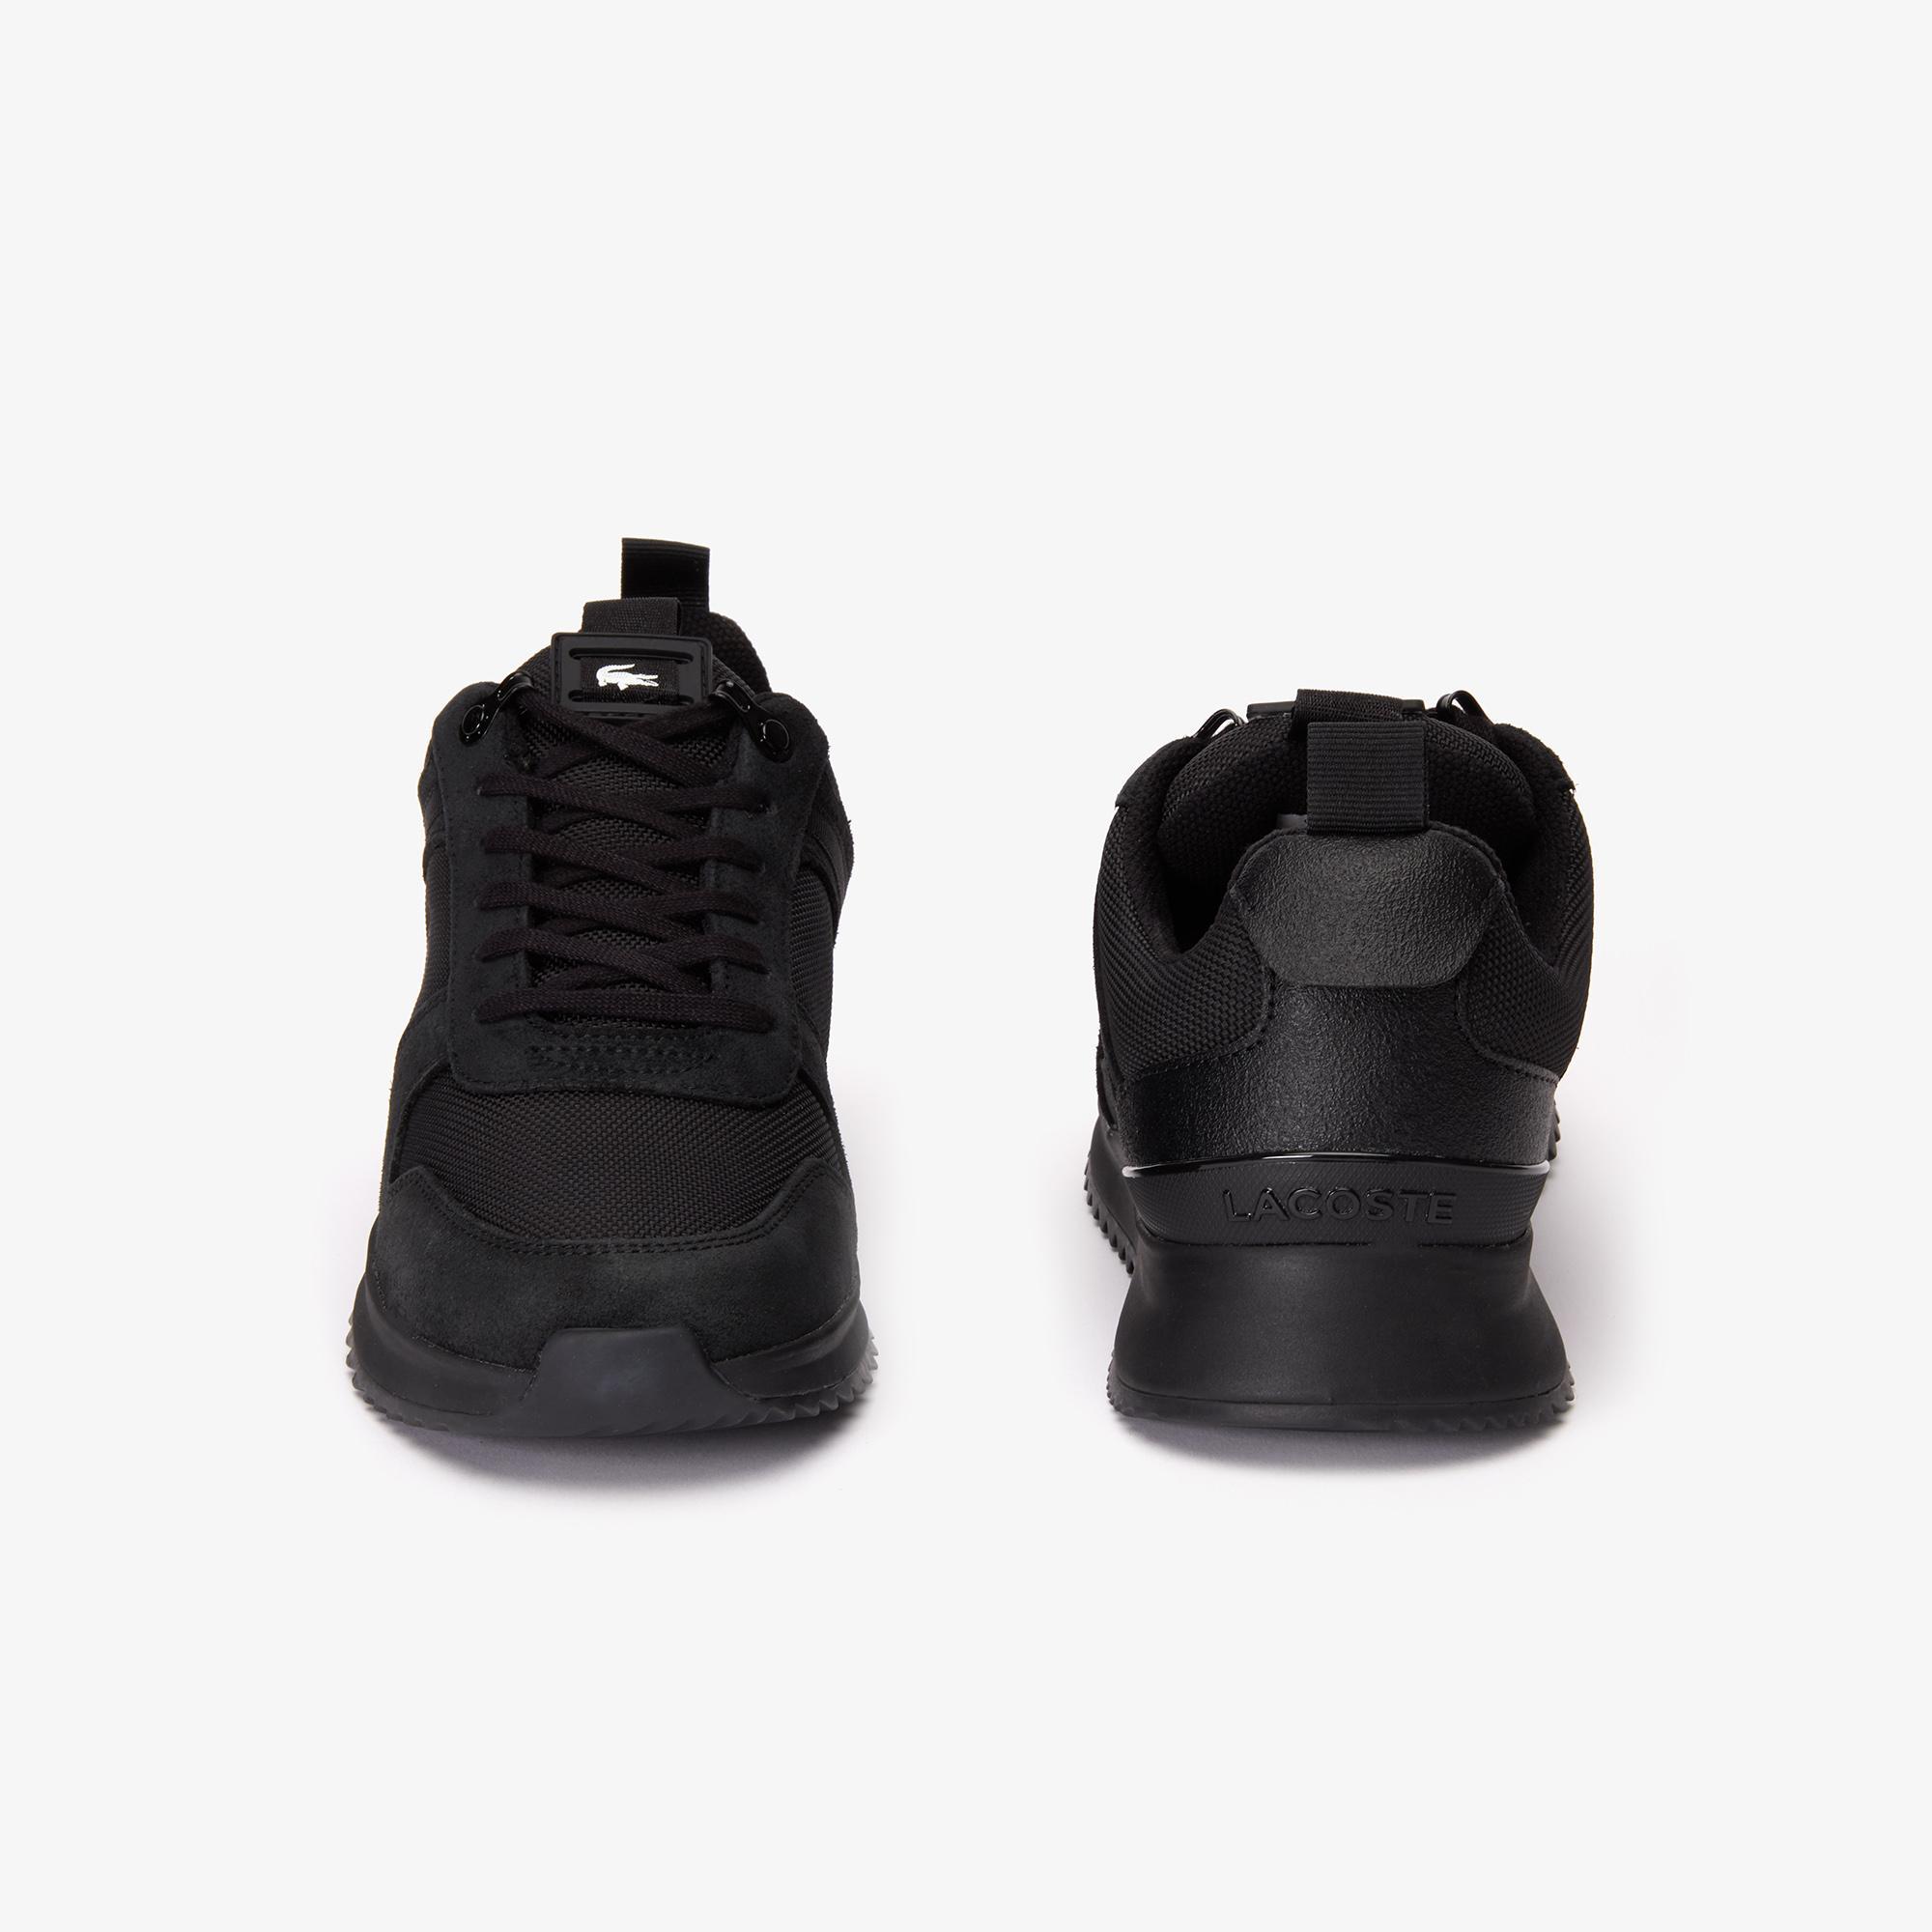 Lacoste Joggeur 2.0 319 3 Sma Męskie Sneakersy